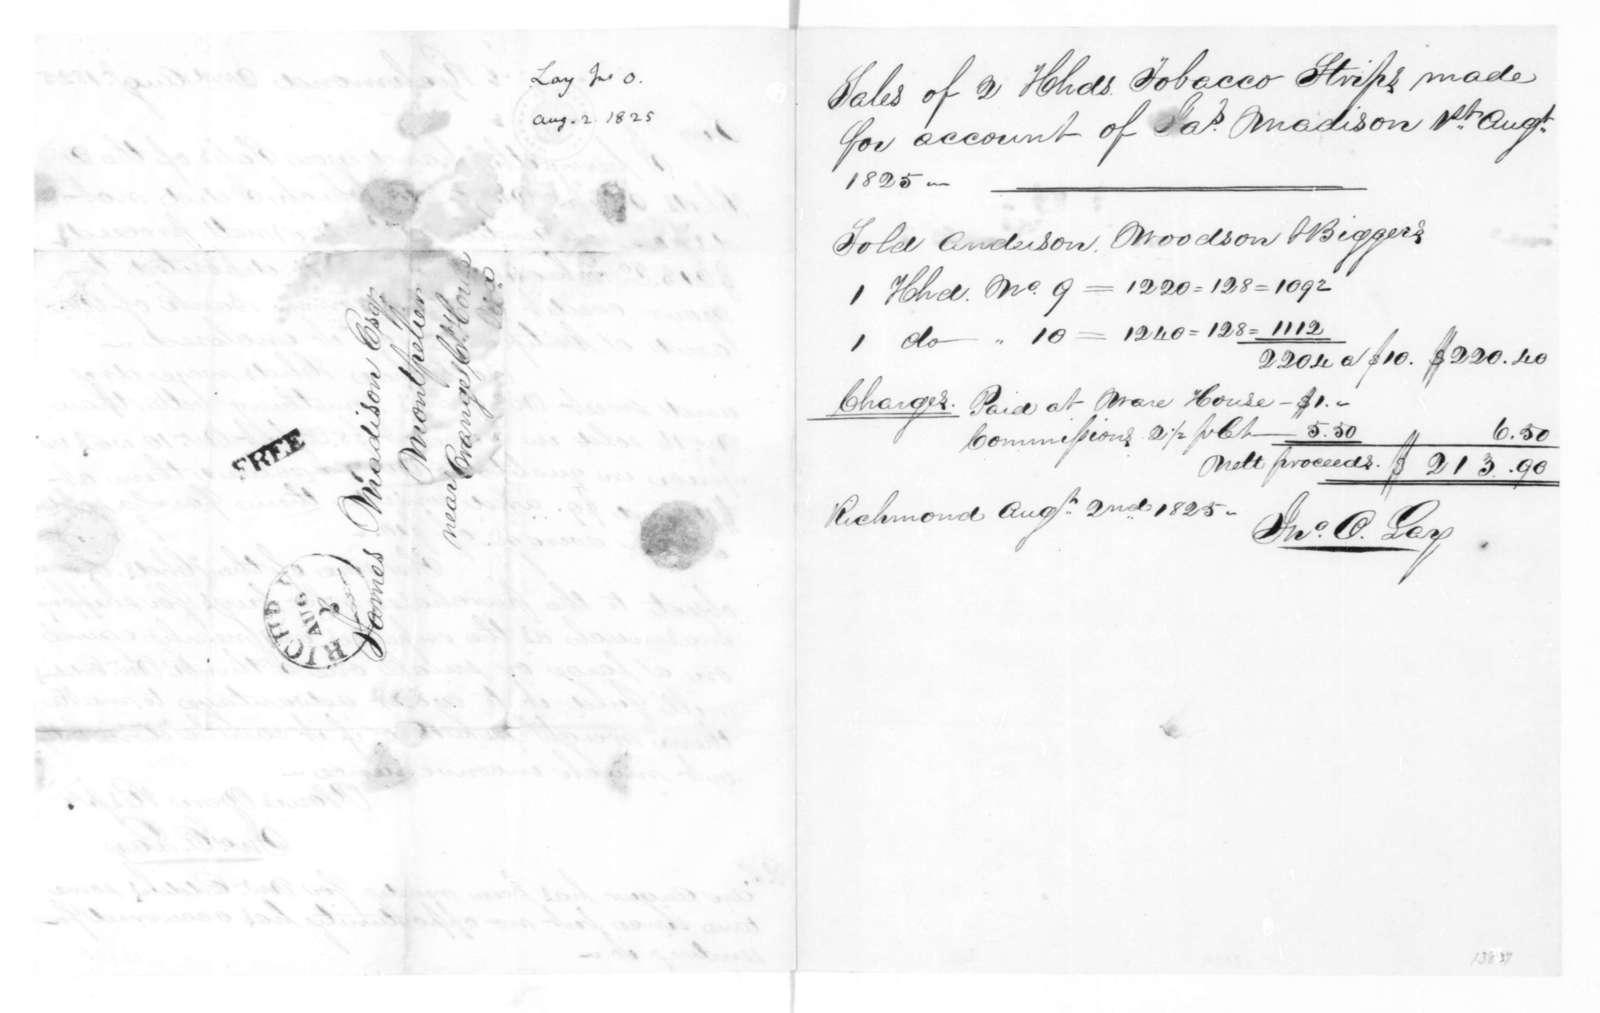 John O. Lay to James Madison, August 2, 1825.